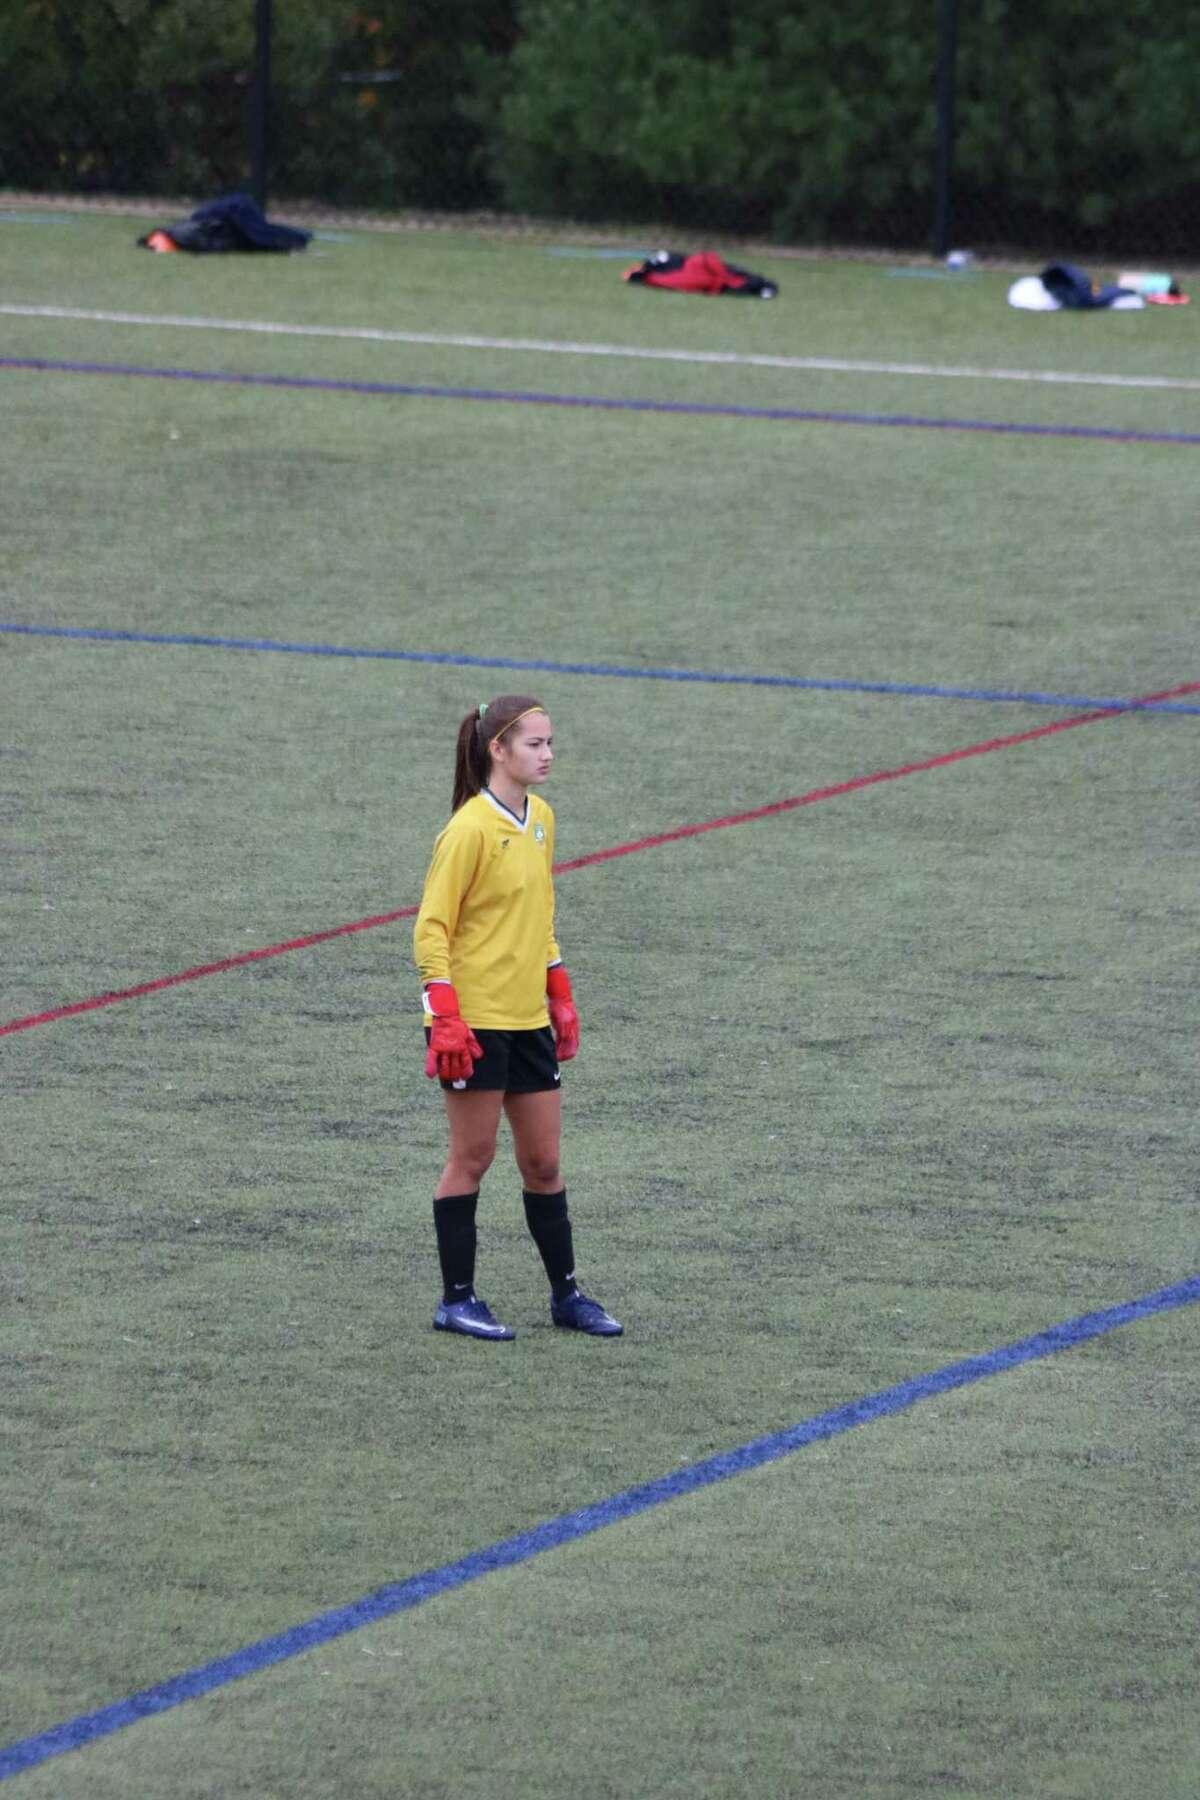 Senior goalie Ella Fugelsang is a senior captain of the Greenwich Academy soccer team